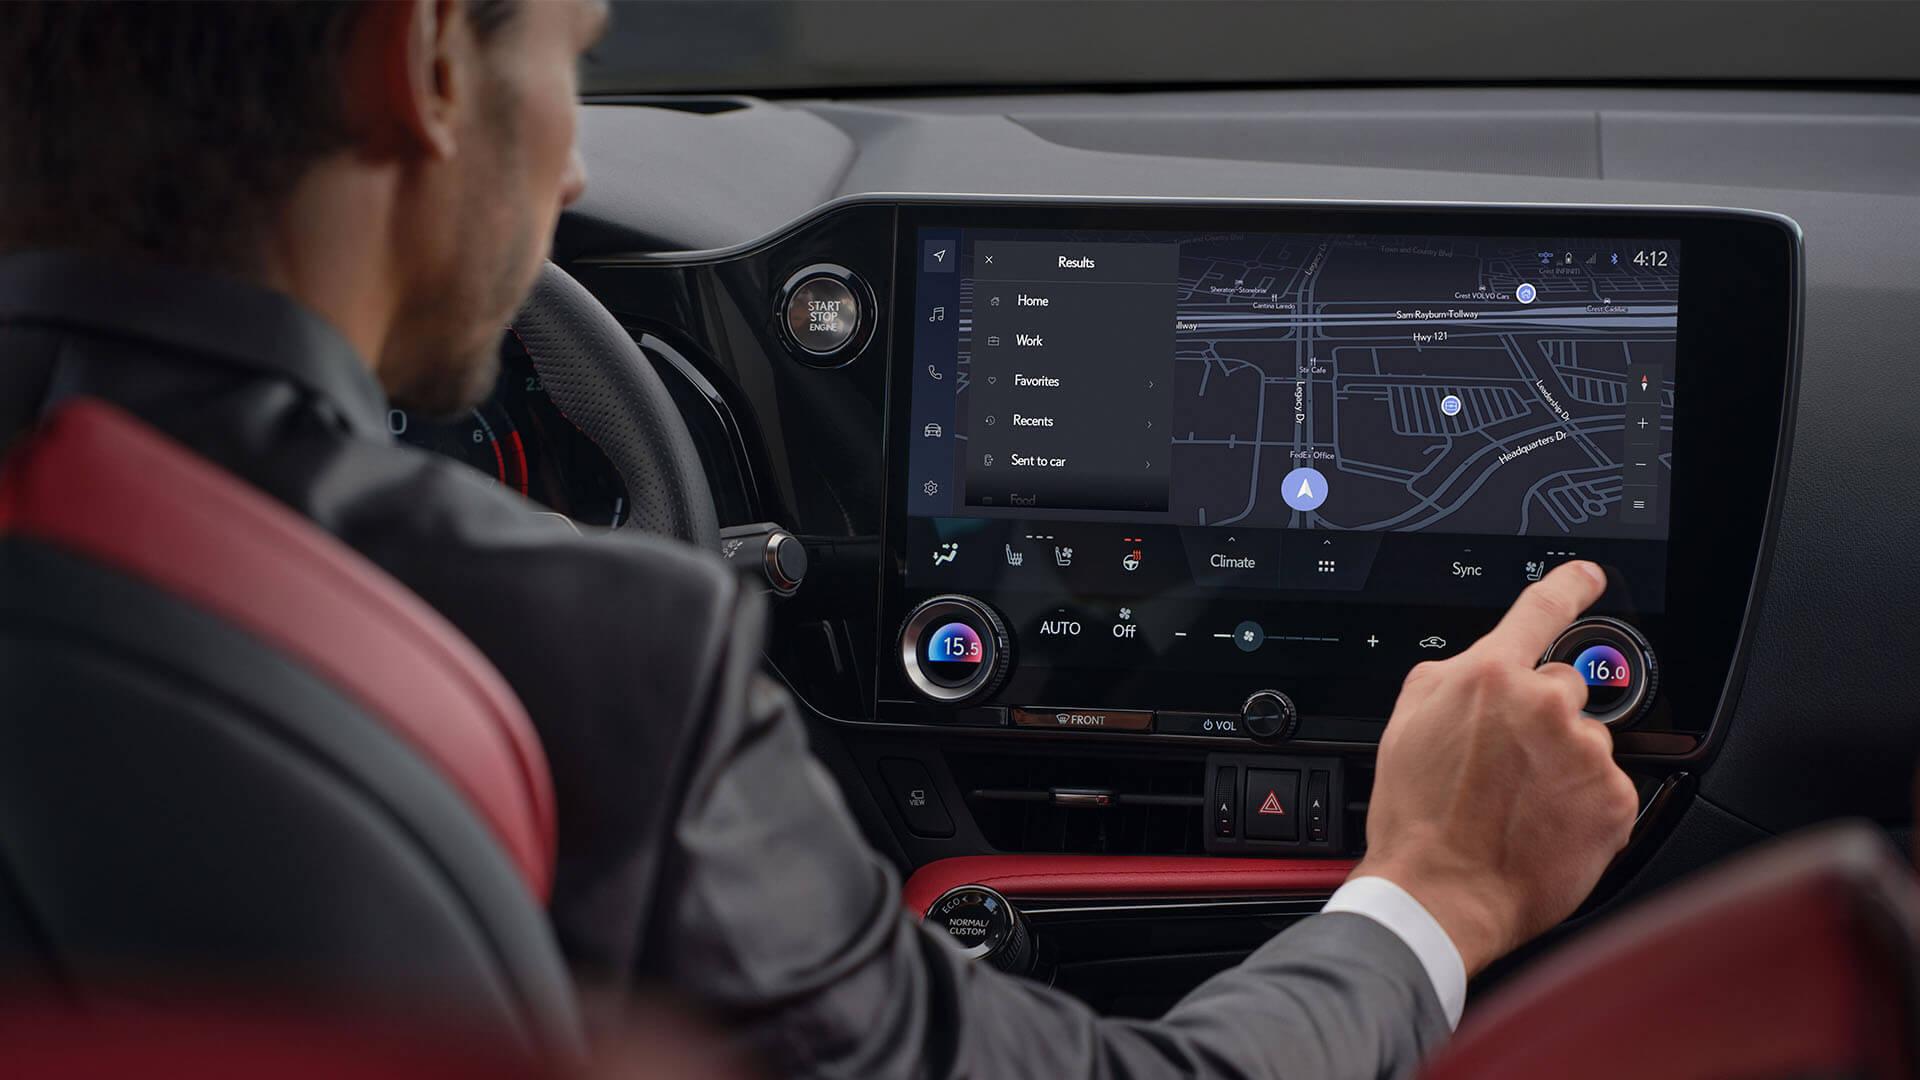 2021 lexus nx experience interior front lexus link multimedia